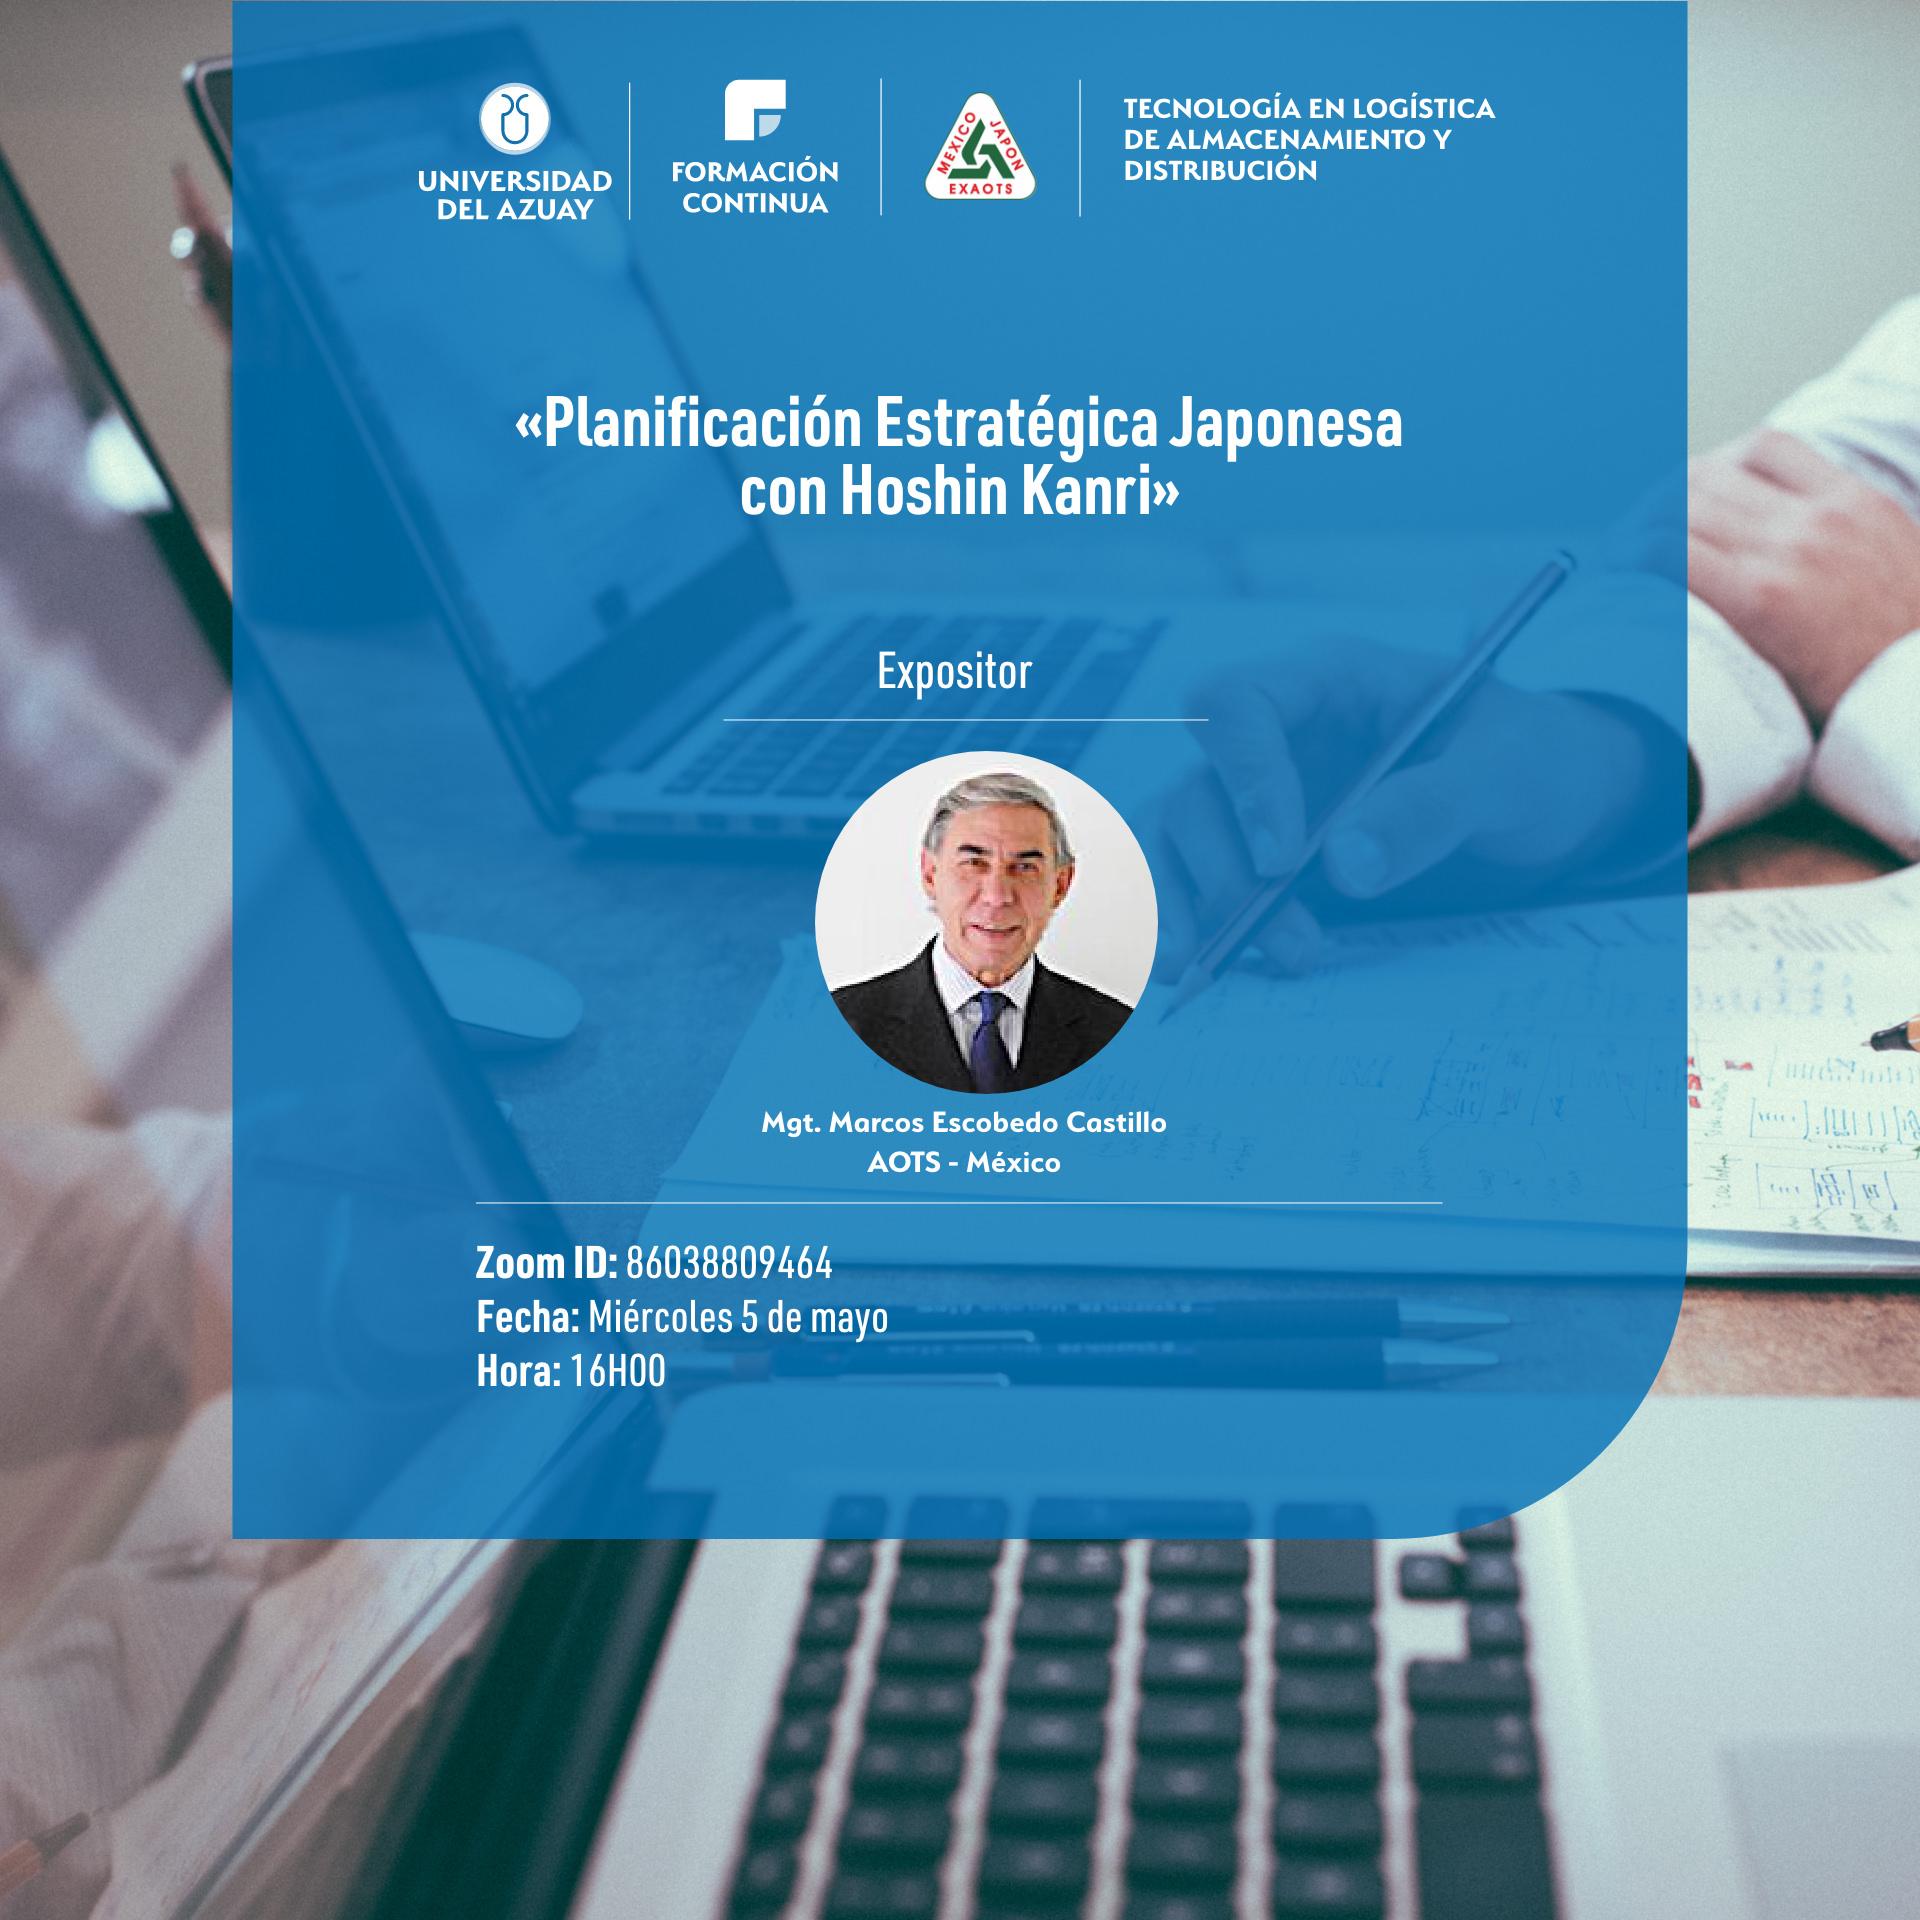 Japanese Strategic Planning Webinar with Hoshin Kanri